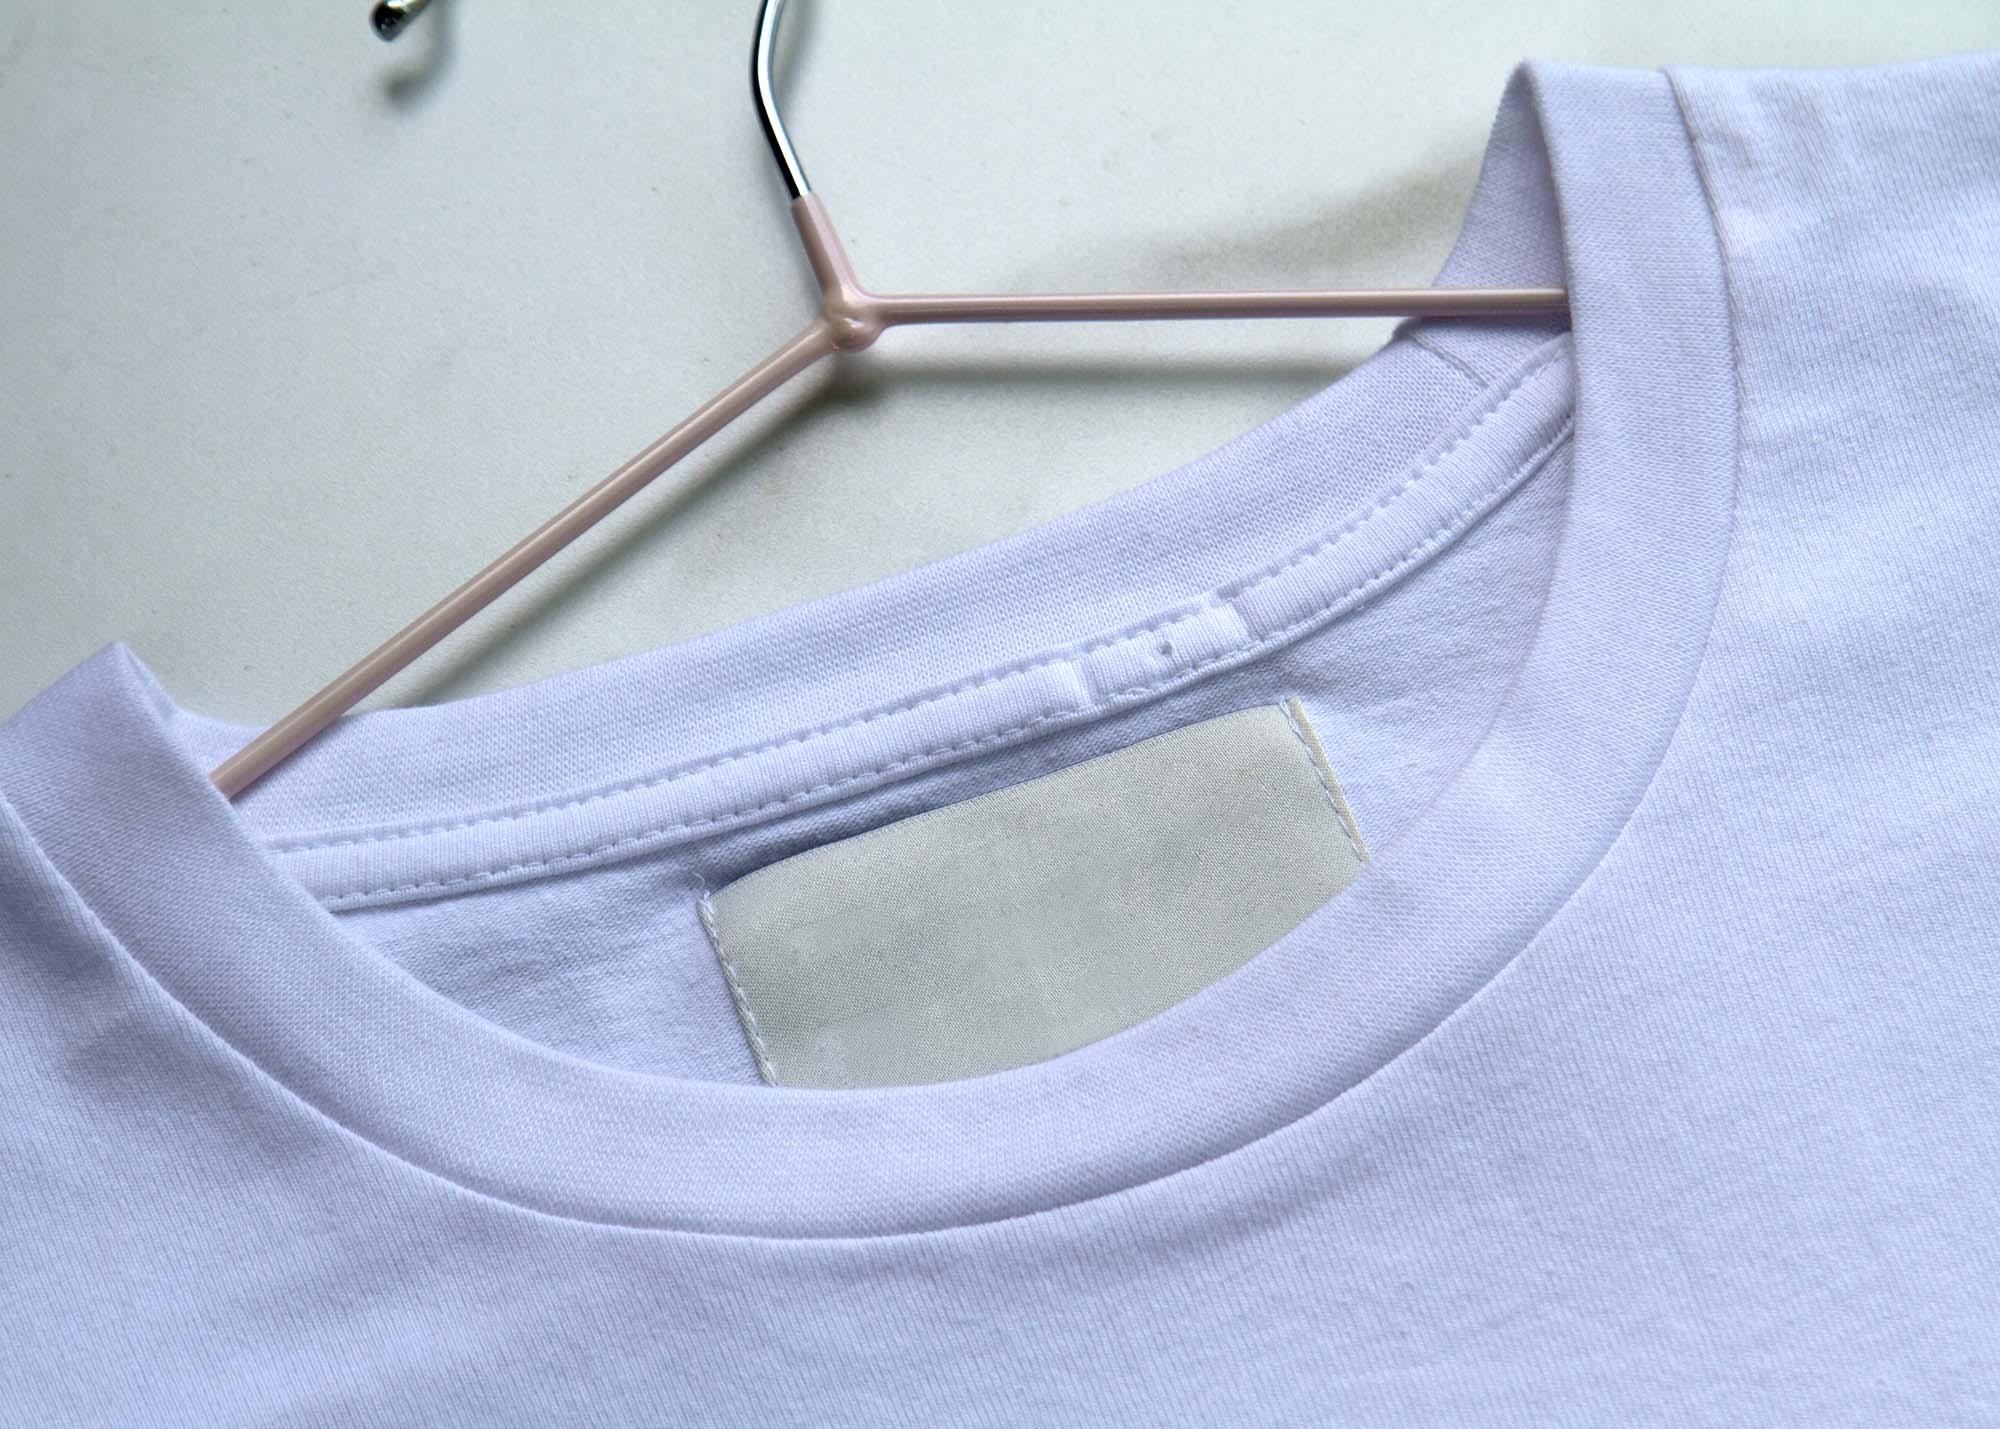 Collar Tag Mockup 2